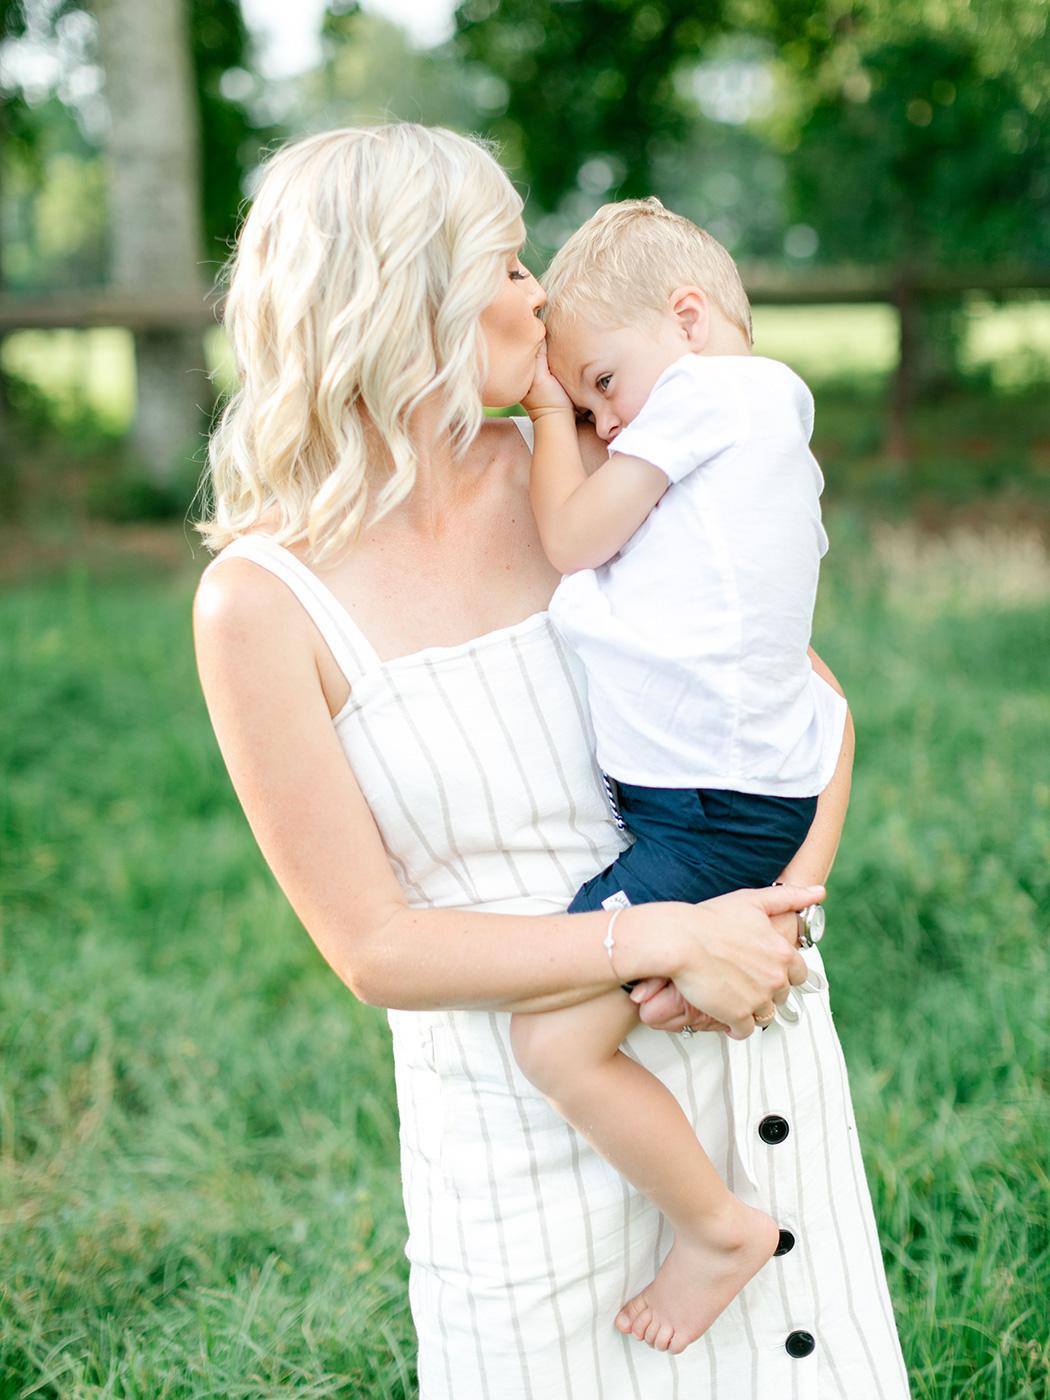 Mom & Son | Rensche Mari Photography